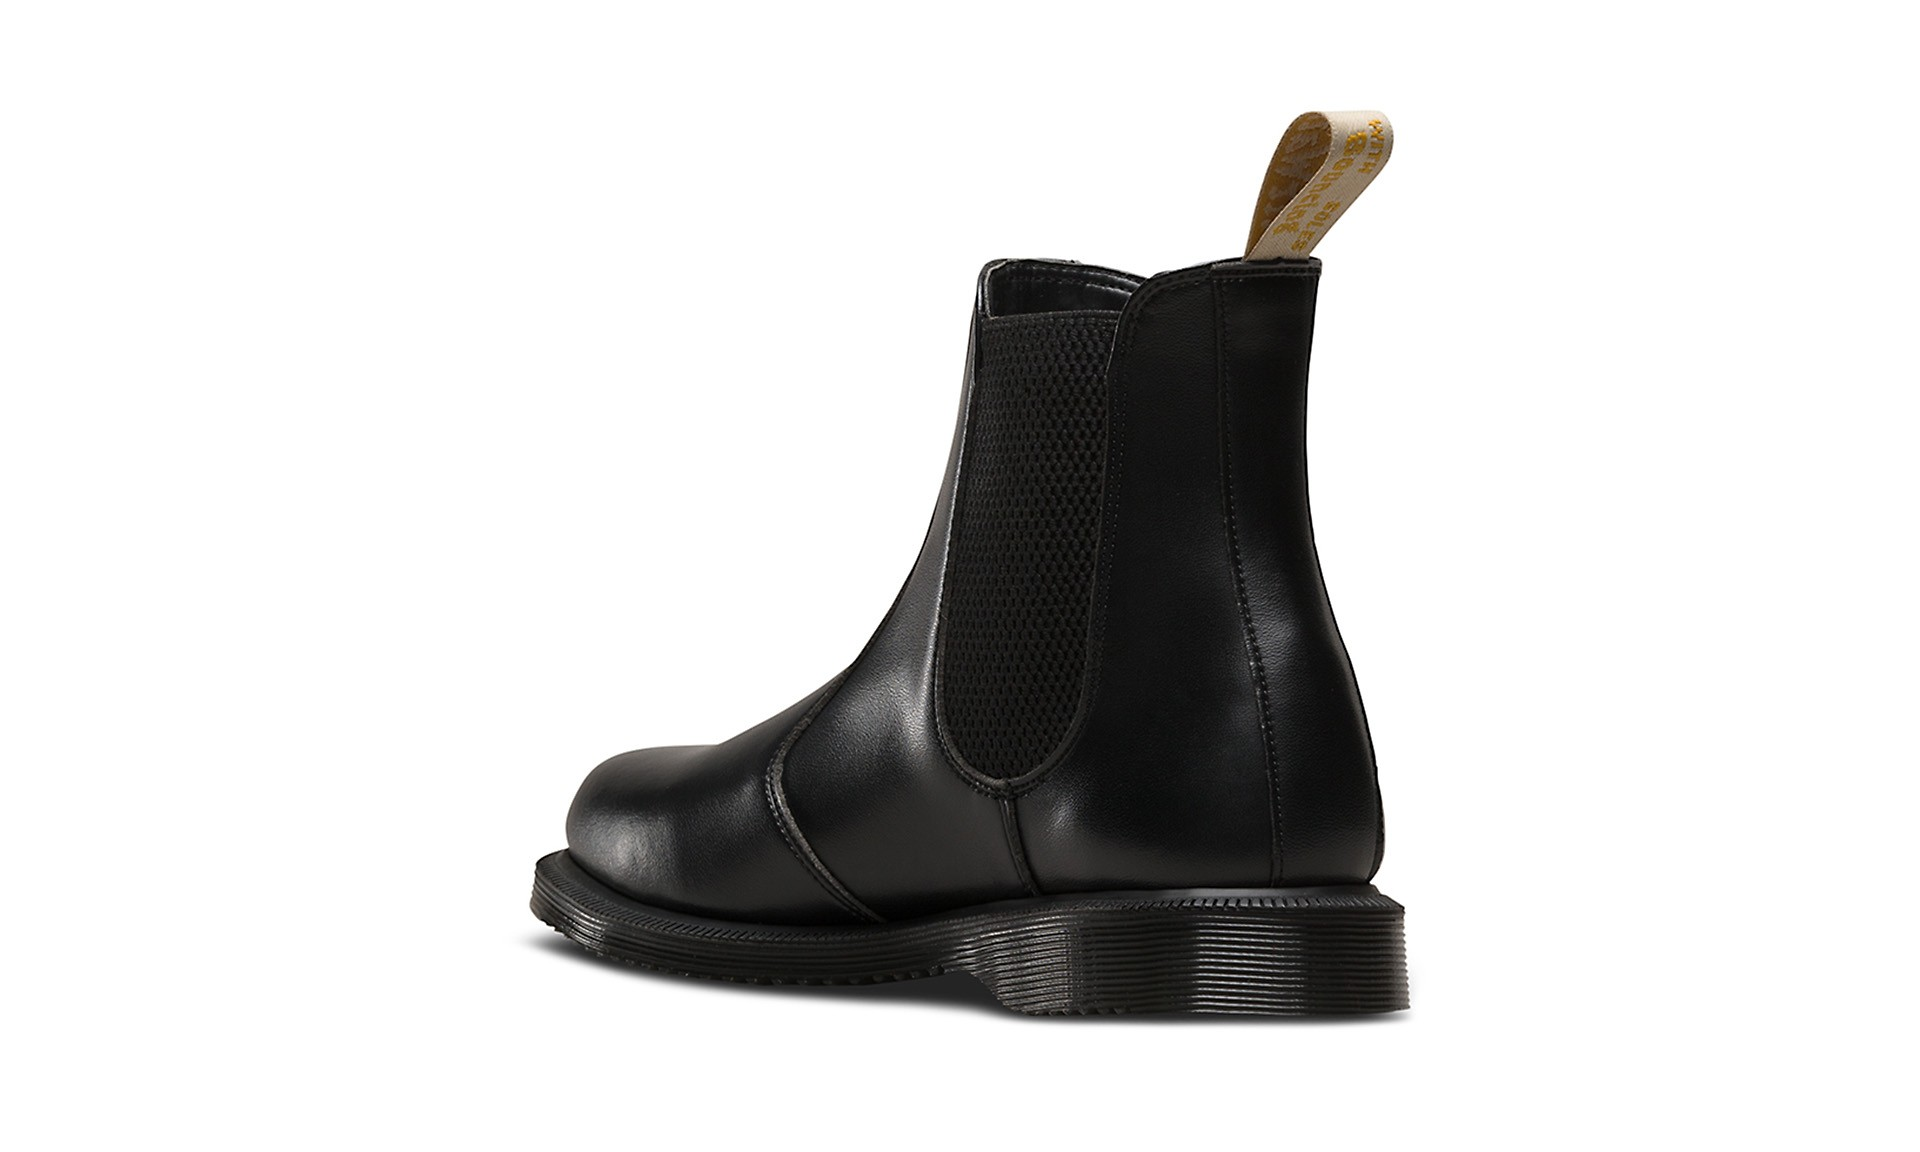 d65ade0af29 Vegan Chelsea Boot | DR. MARTENS Flora Chelsea Boot Black Felix Rub ...